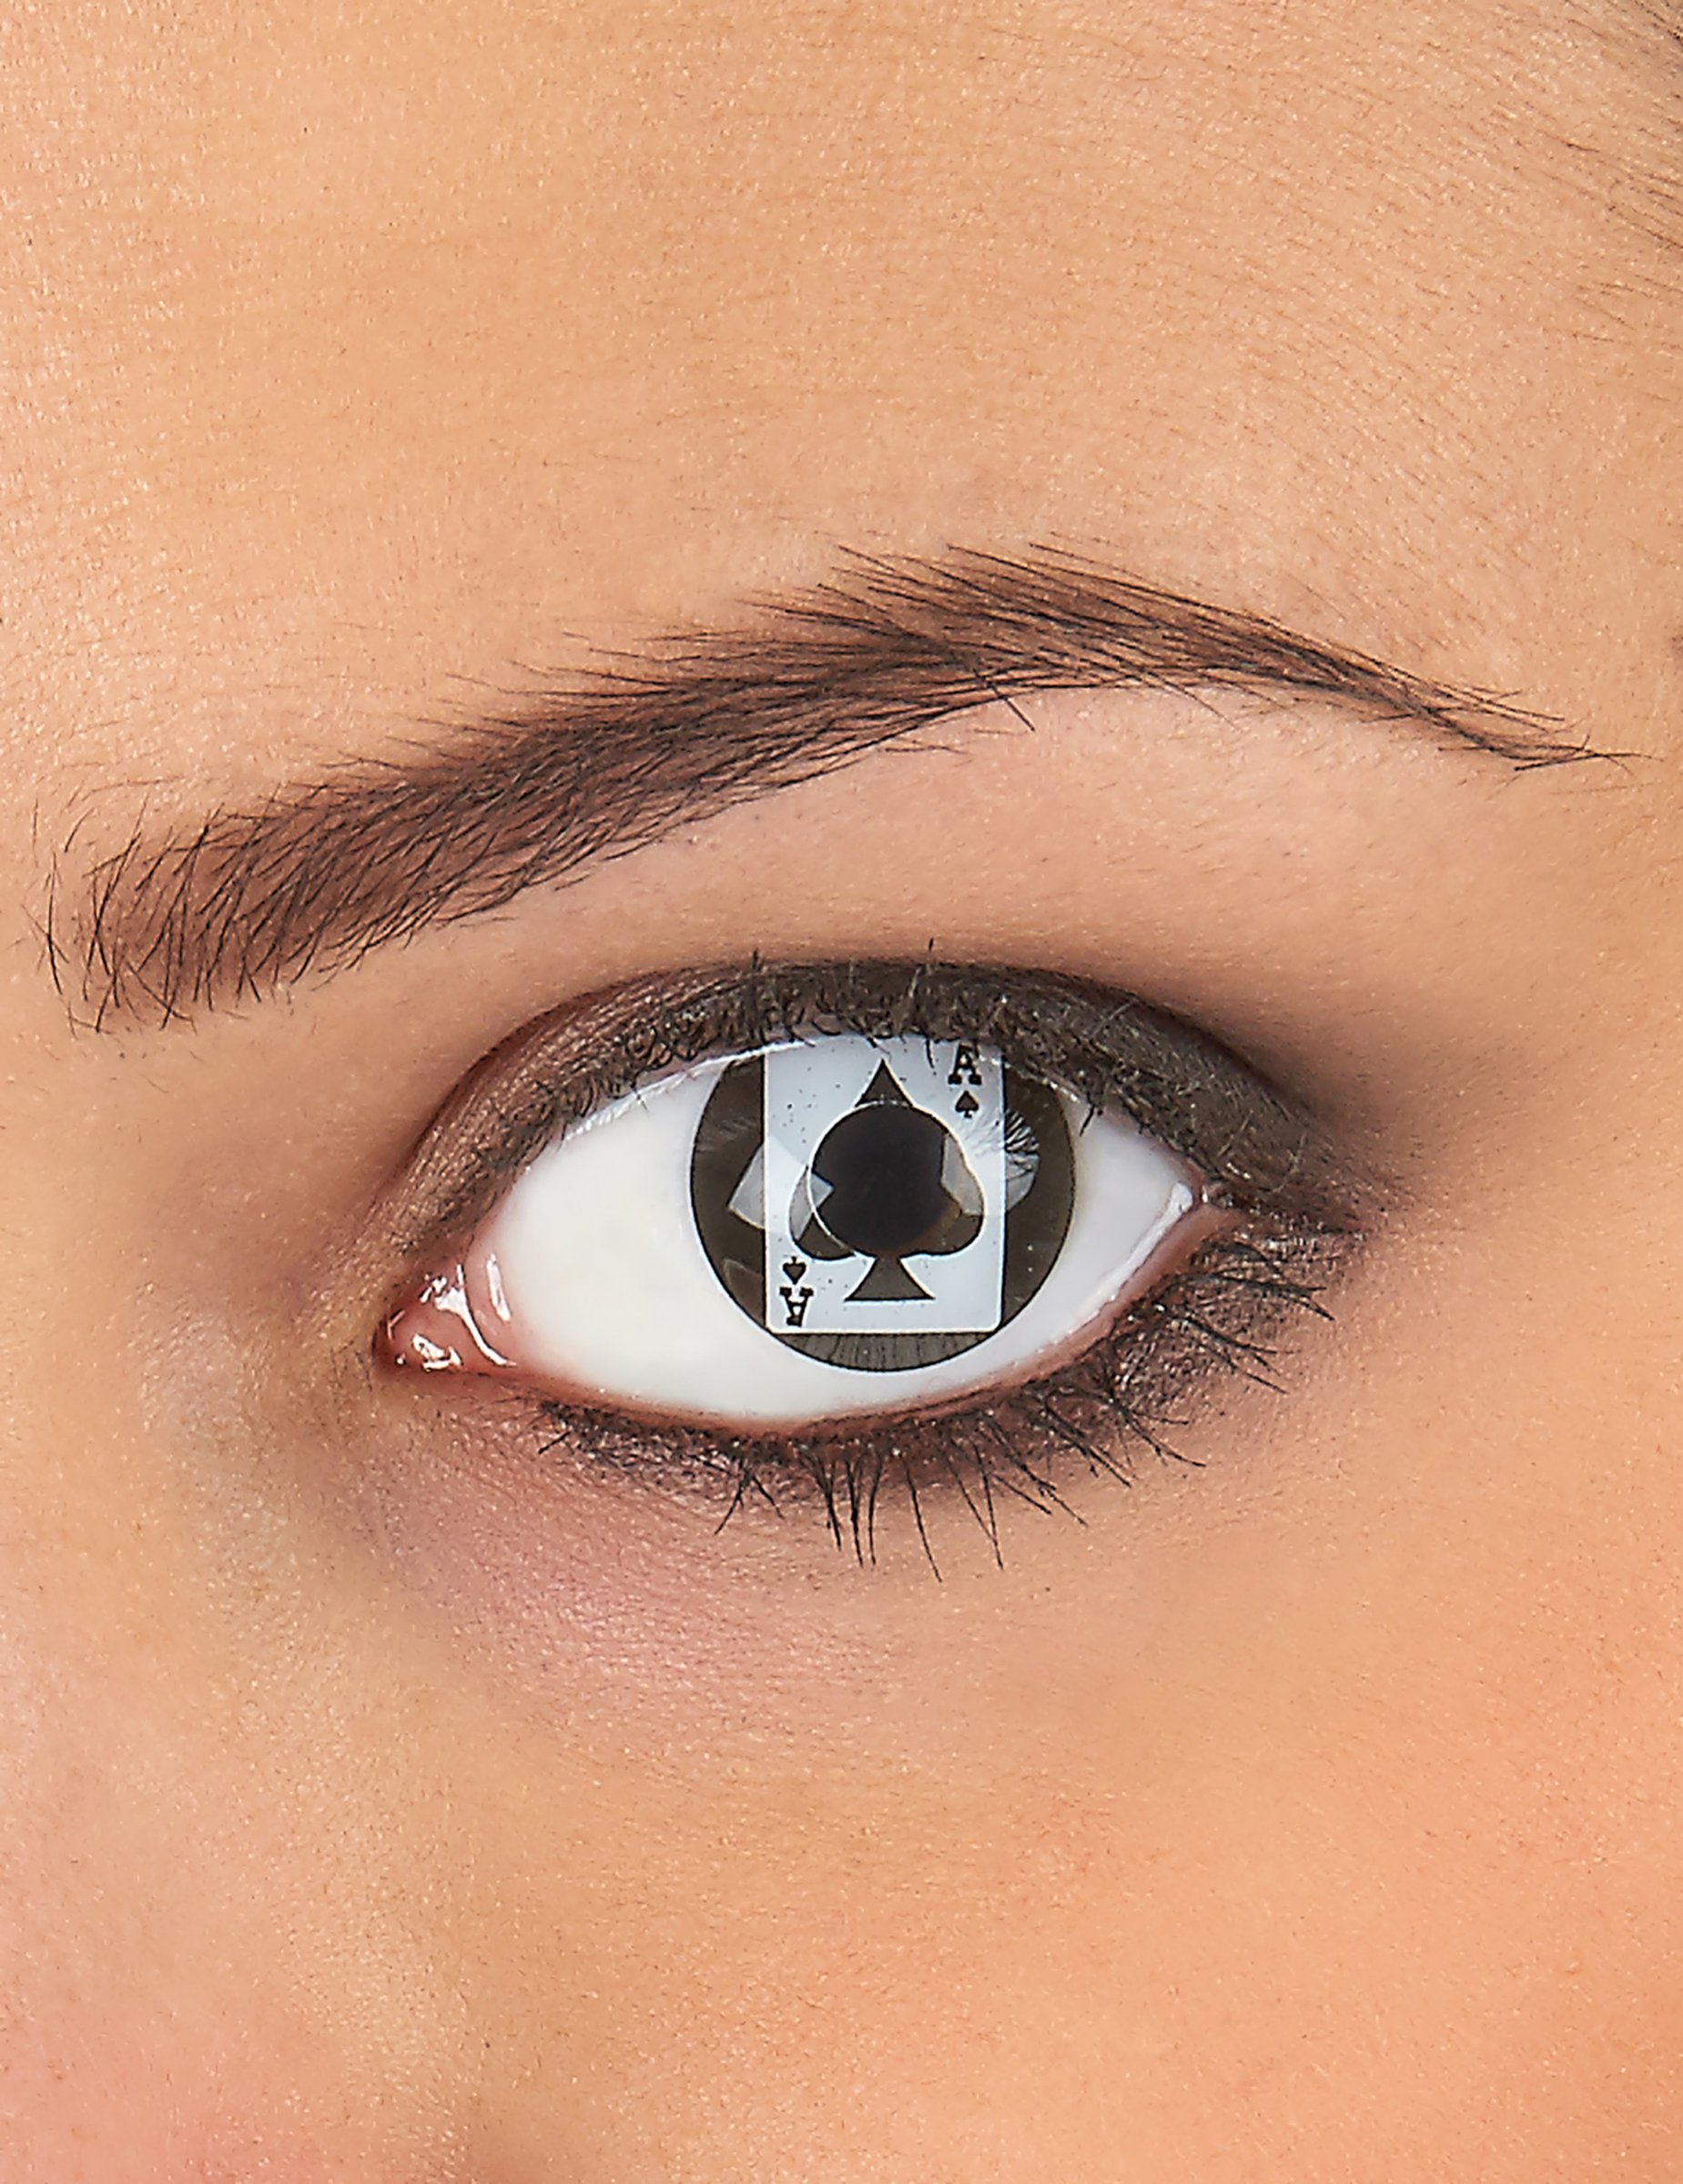 online kontaktlinsen shop telemark